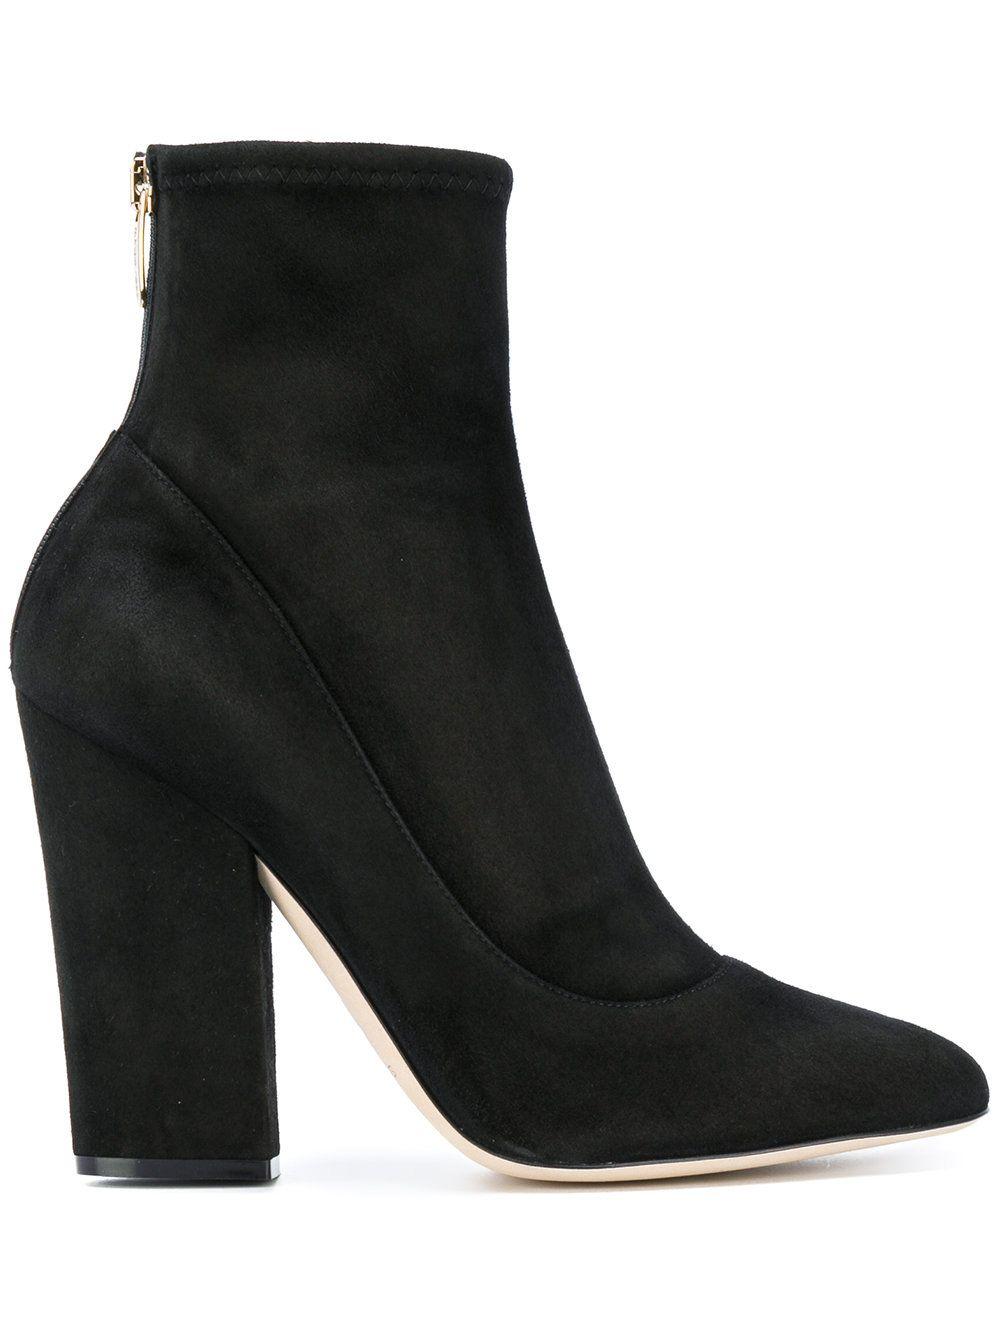 sock style ankle boots - Black Sergio Rossi E4bo57